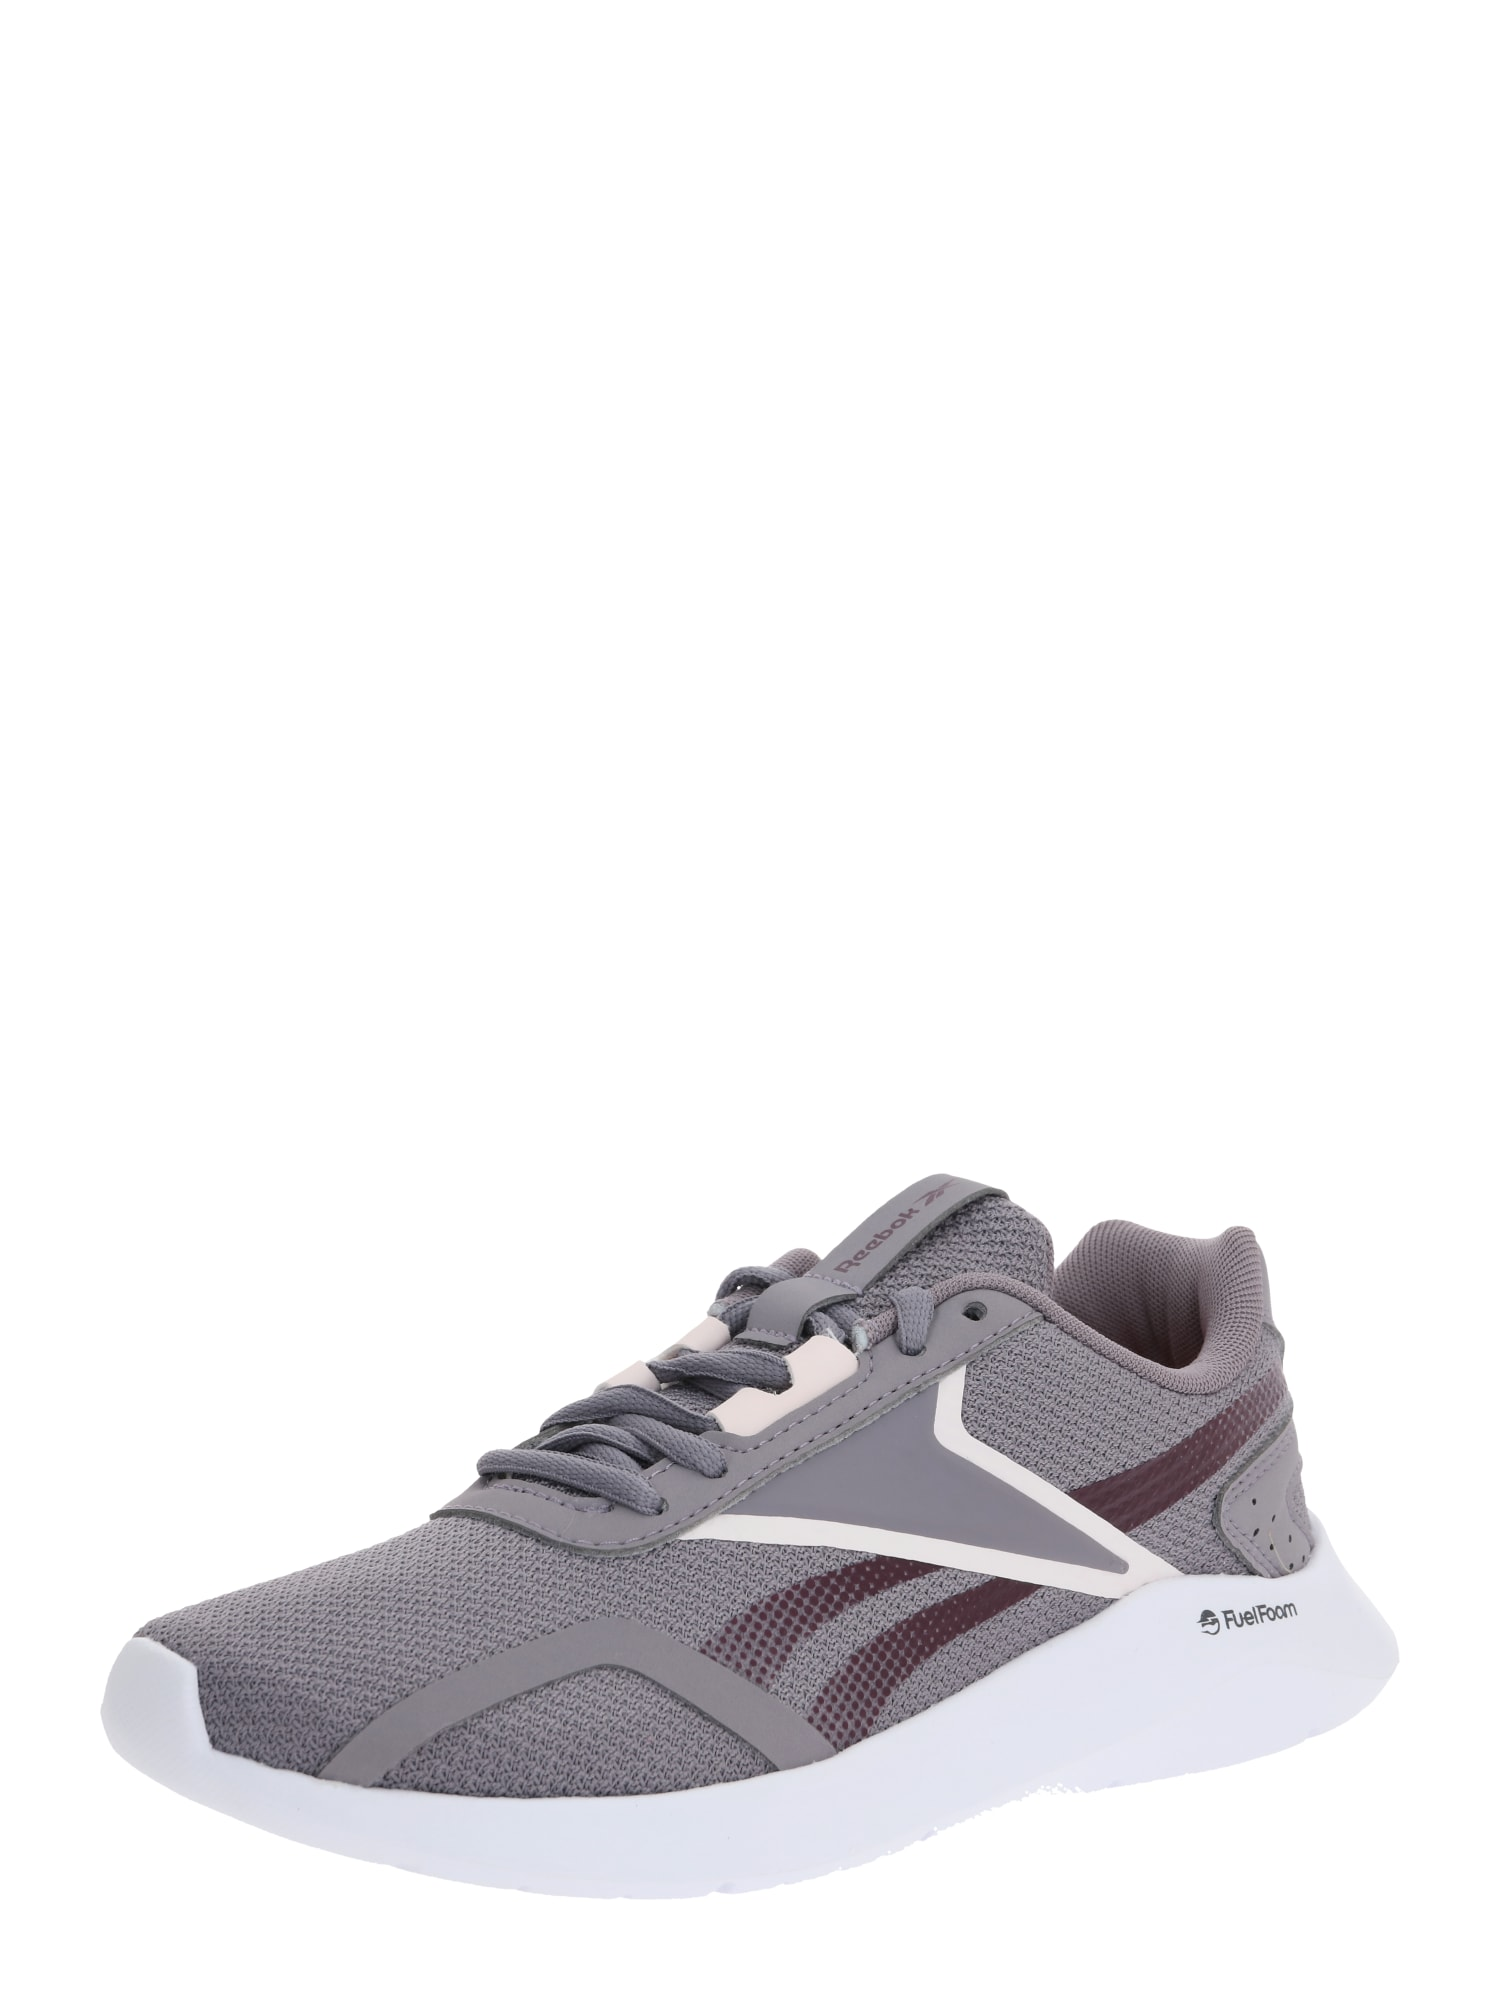 REEBOK Bežecká obuv  tmavofialová / sivá